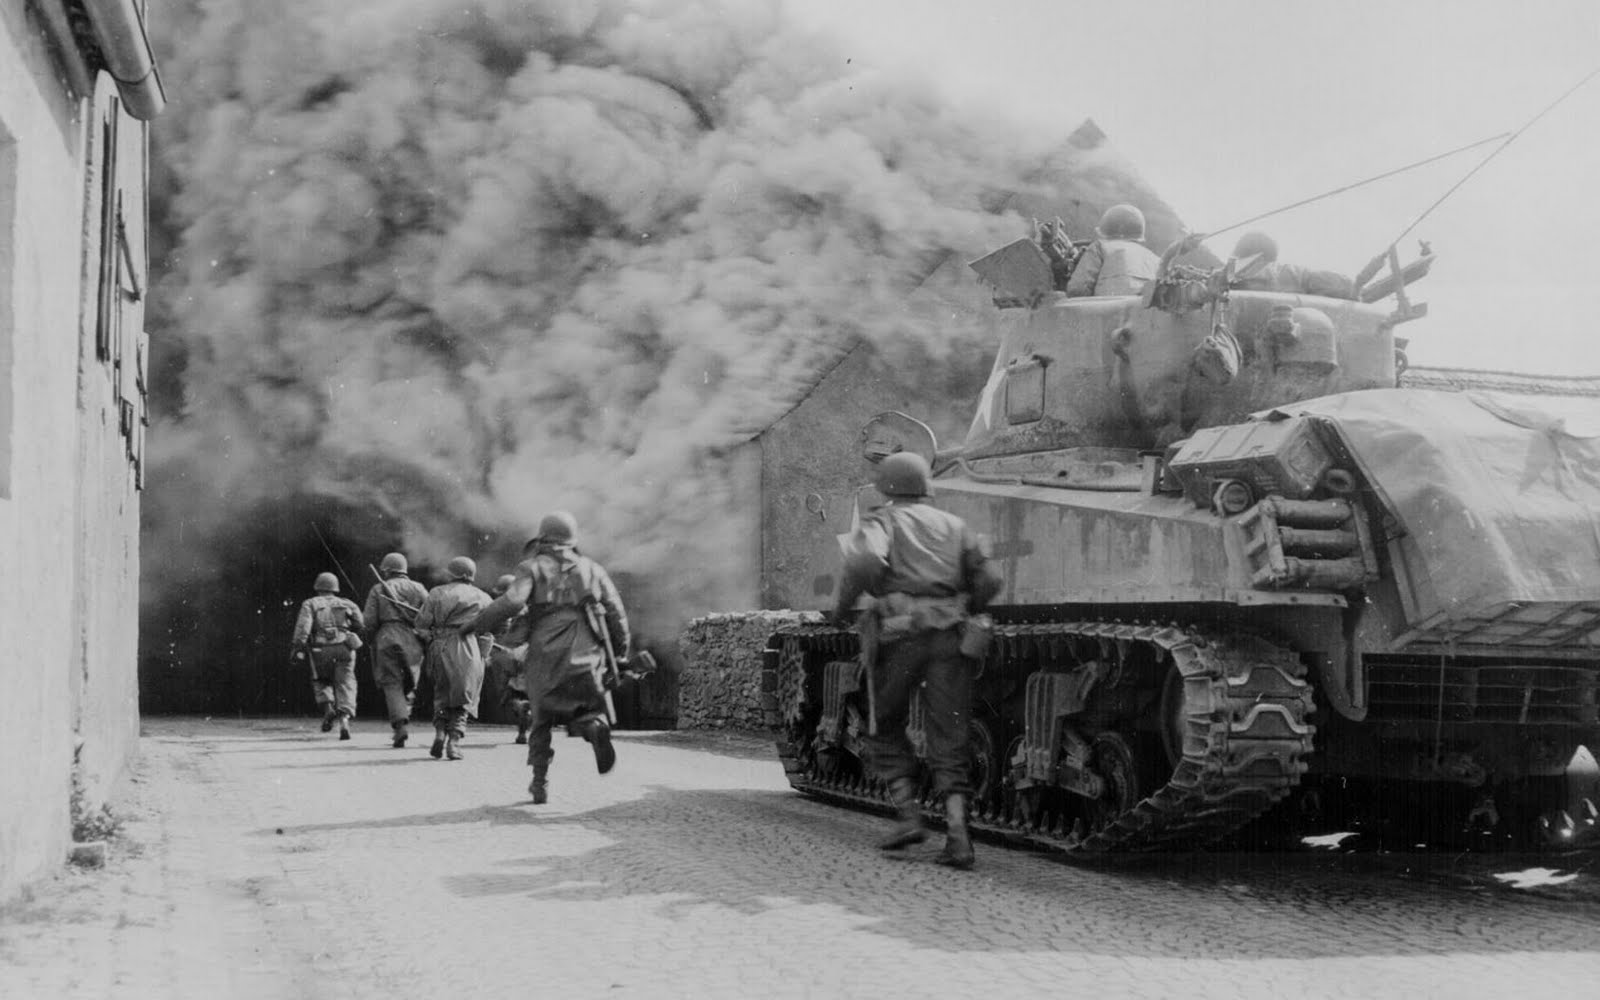 tanks in world war ii wallpapers. Black Bedroom Furniture Sets. Home Design Ideas